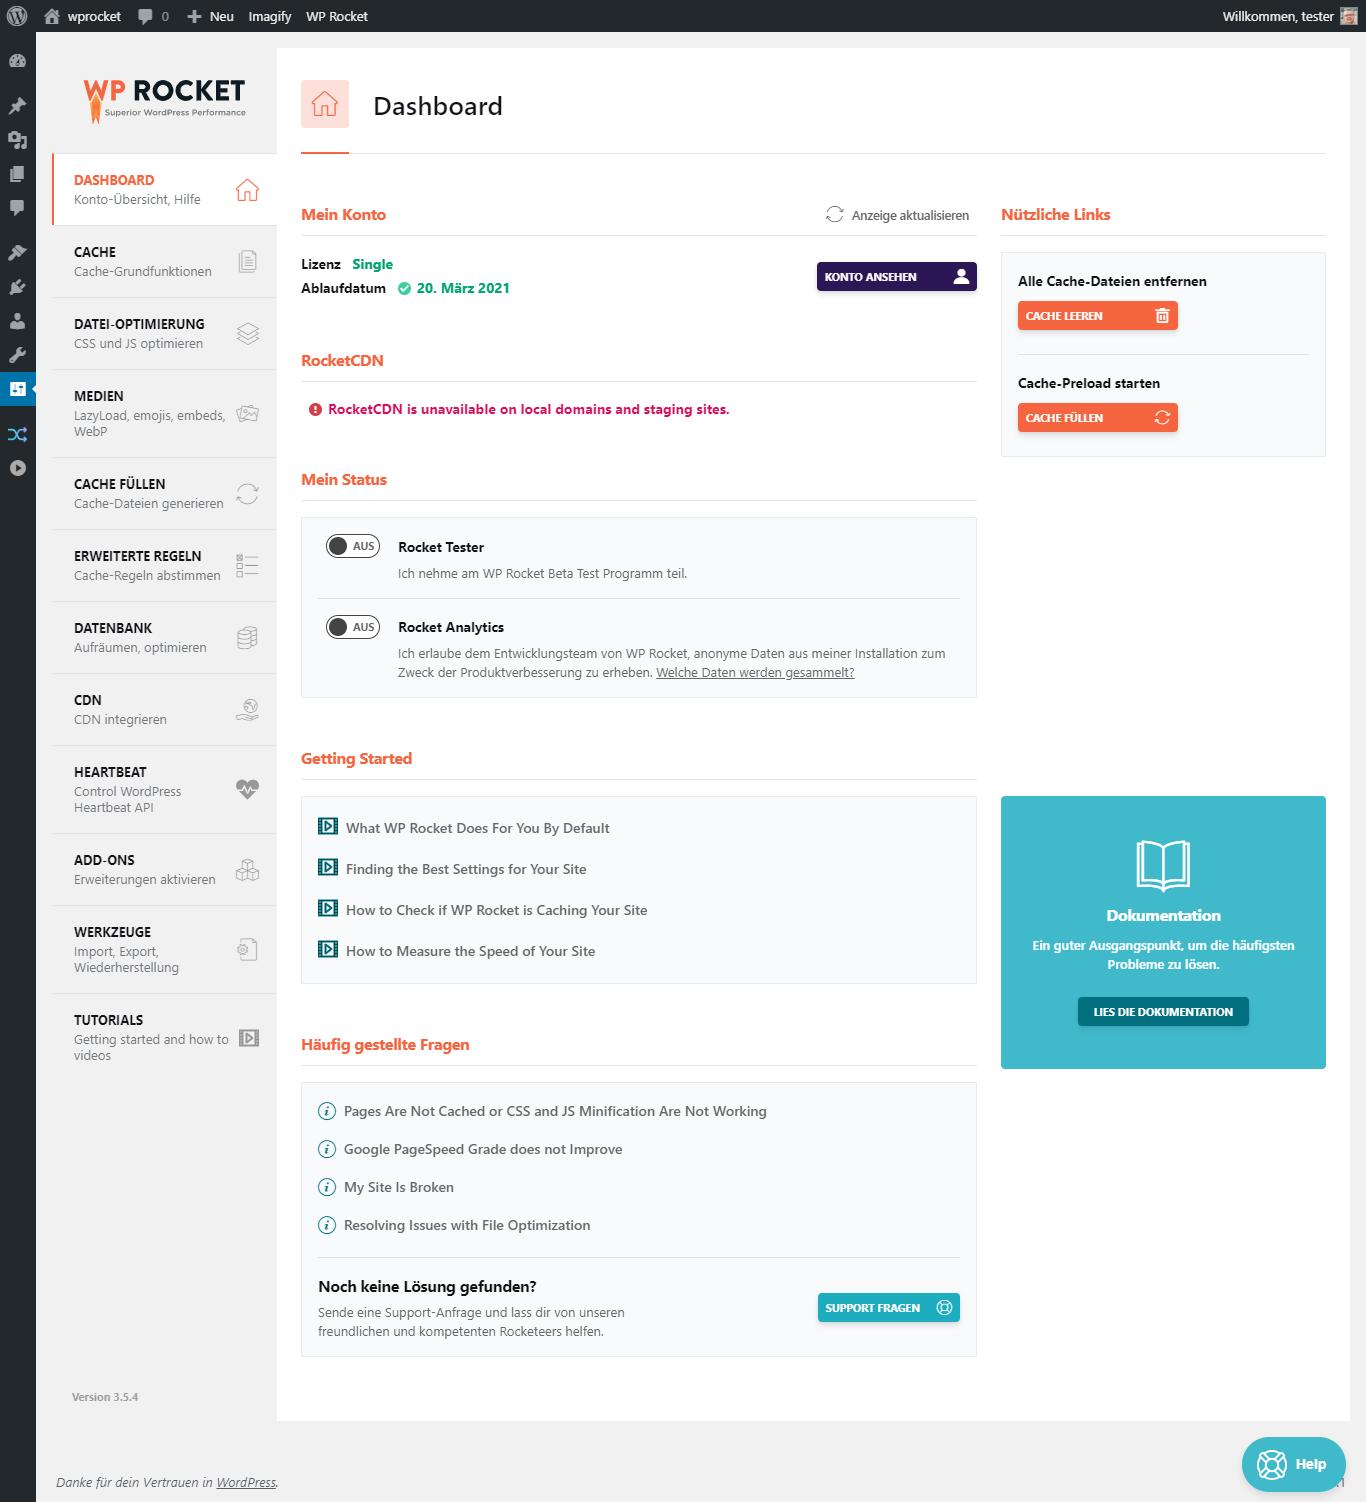 wp rocket 01 dashboard - WP Rocket Review: The fastest WordPress Caching Plugin?